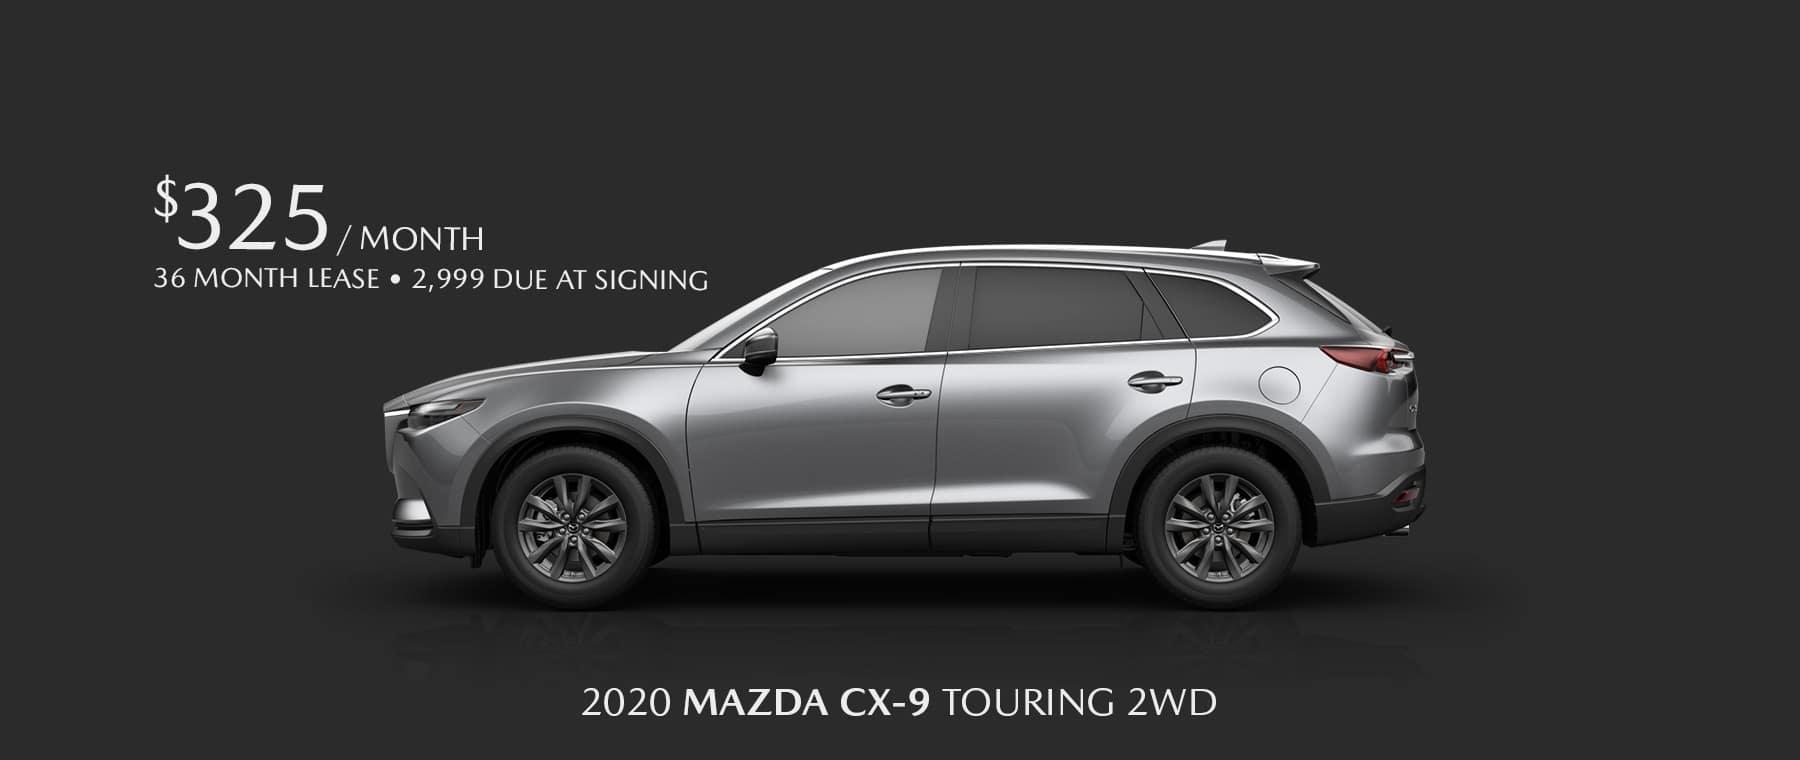 Mazda_CX9_325MO_1800x760